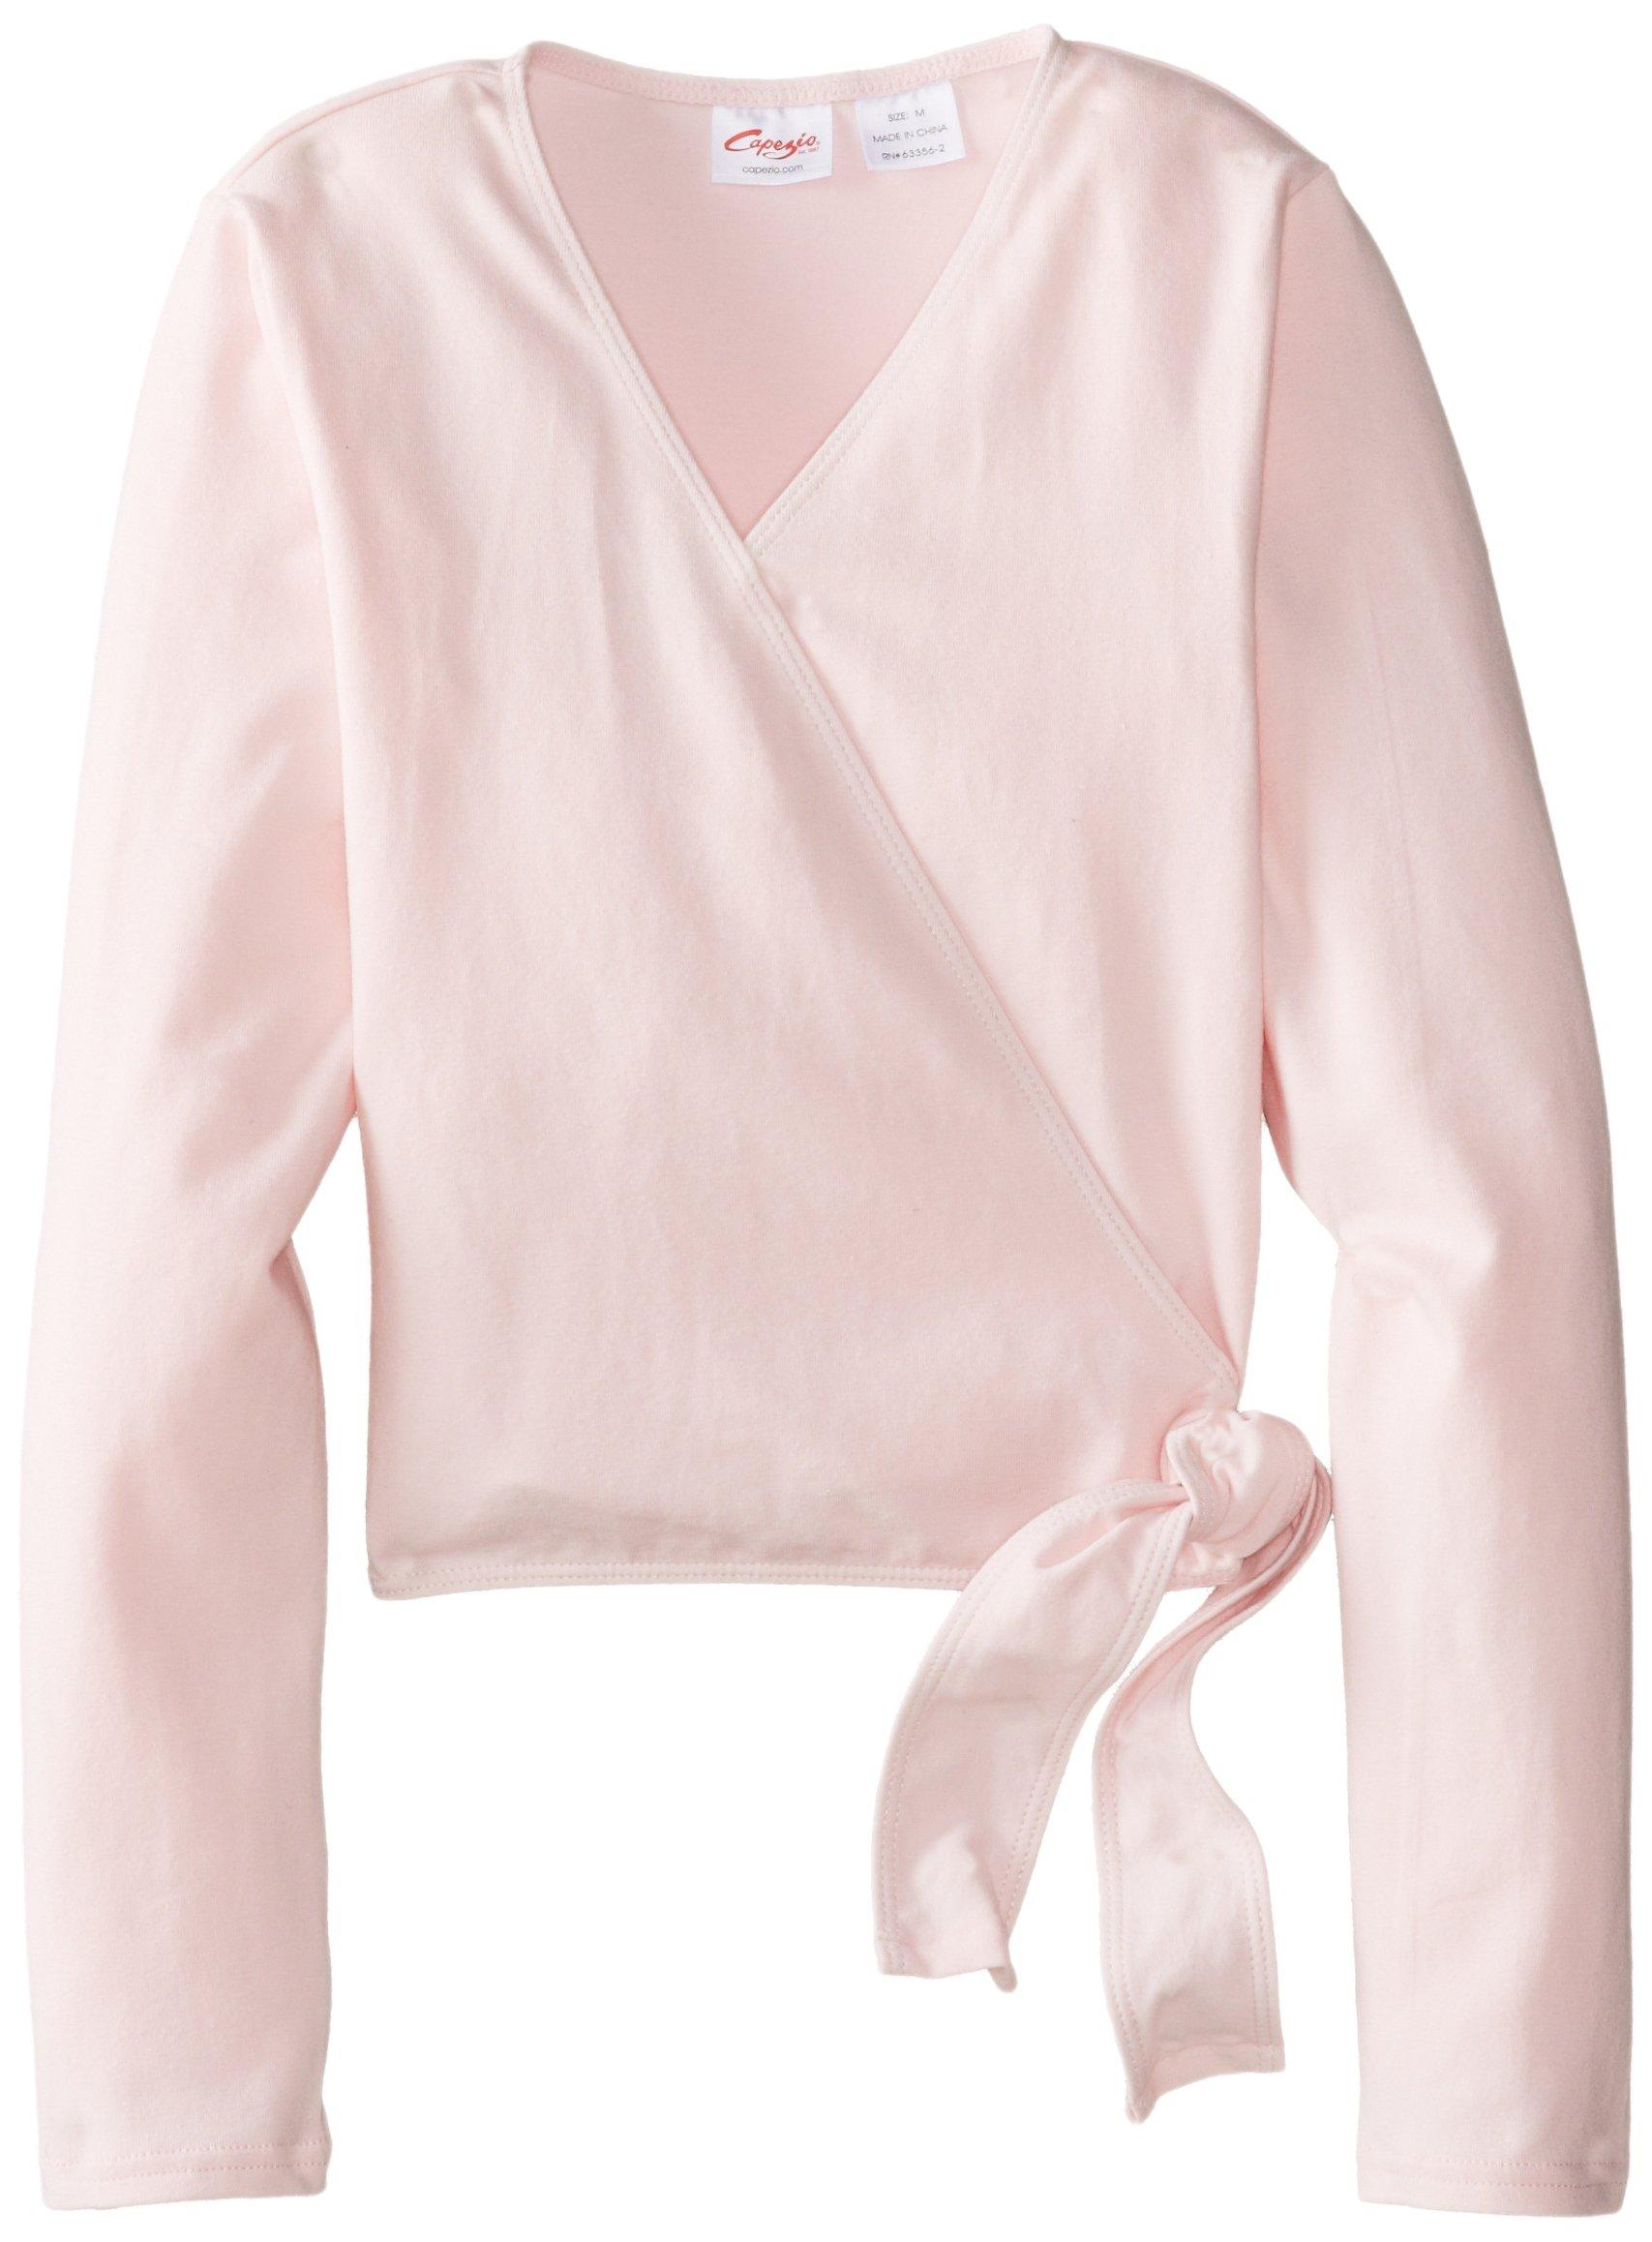 Capezio Big Girls' Classics Wrap Top, Pink, Medium